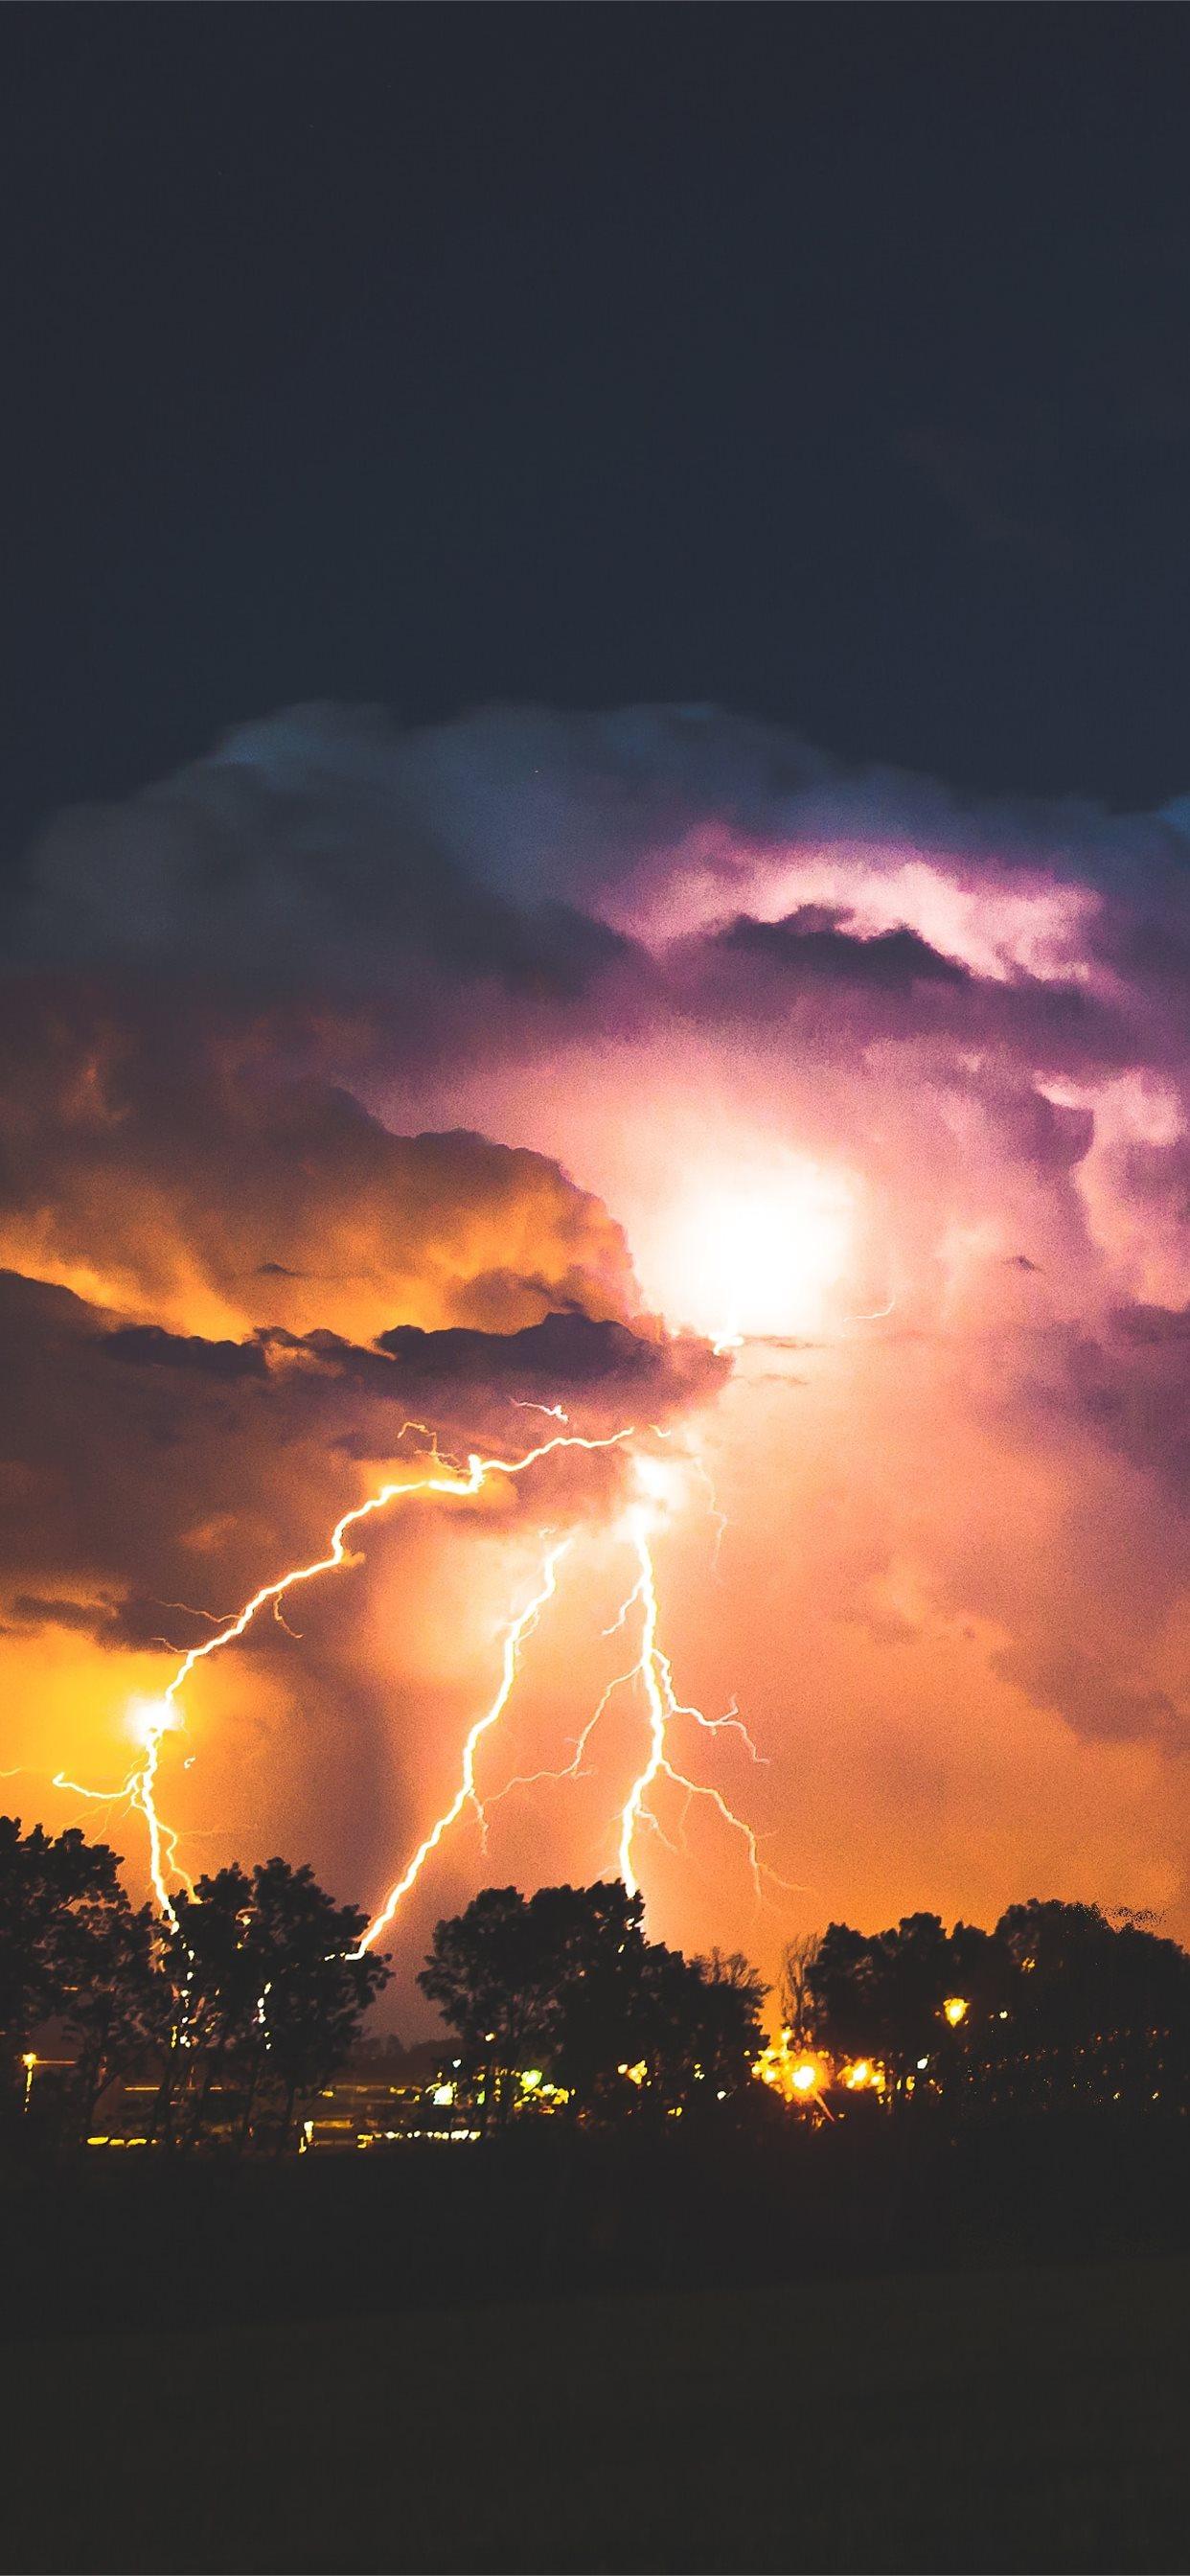 lightning strike at night iphone xs max wallpaper